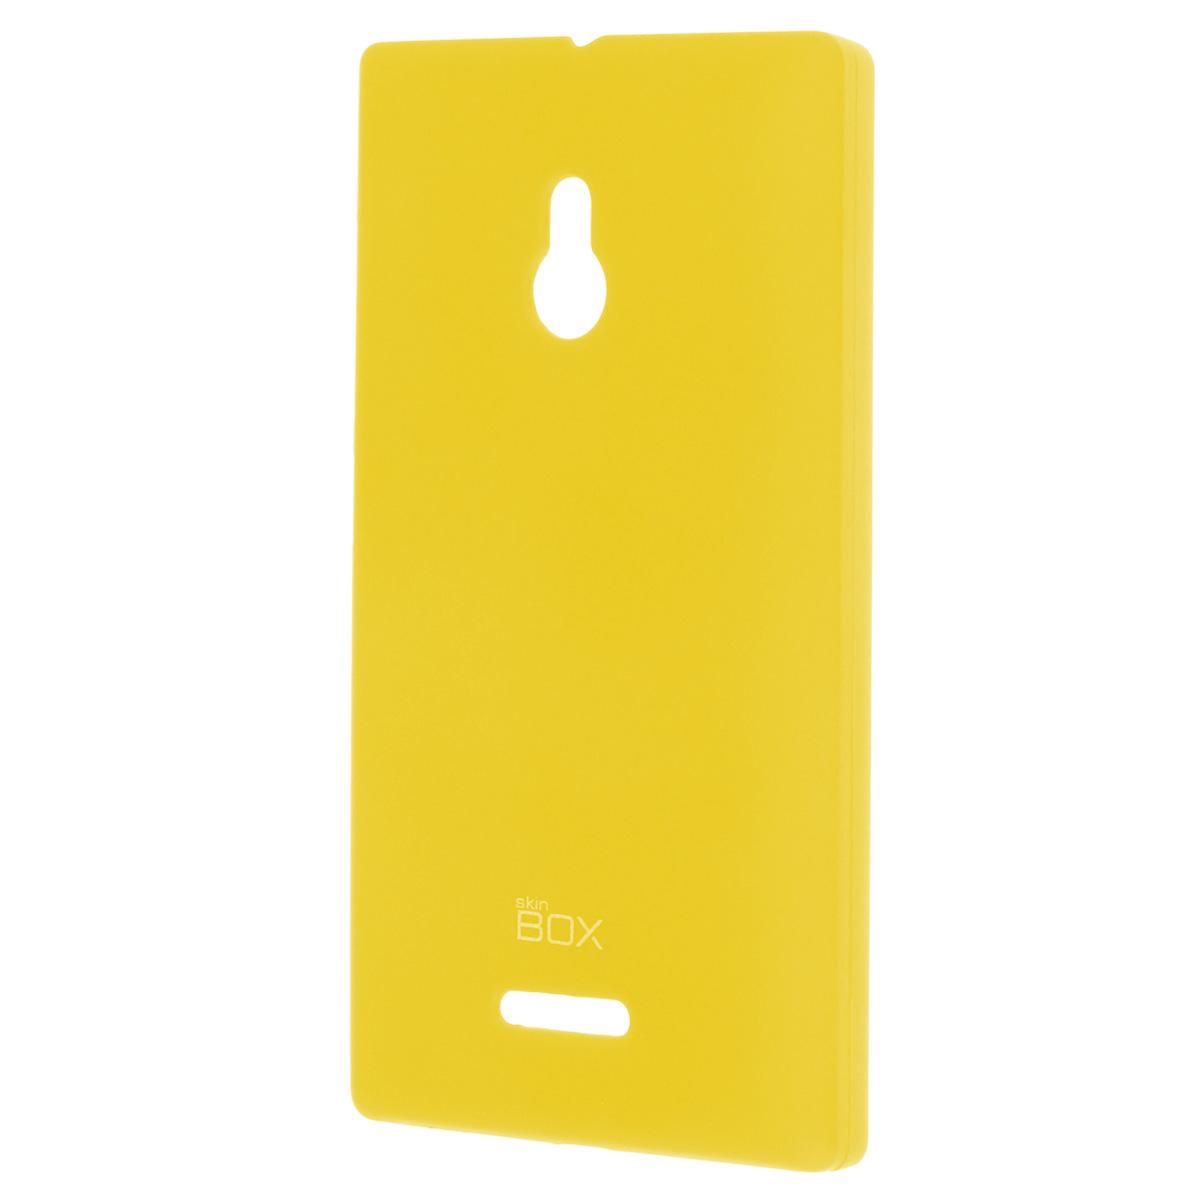 Skinbox Shield 4People чехол для Nokia XL, Yellow